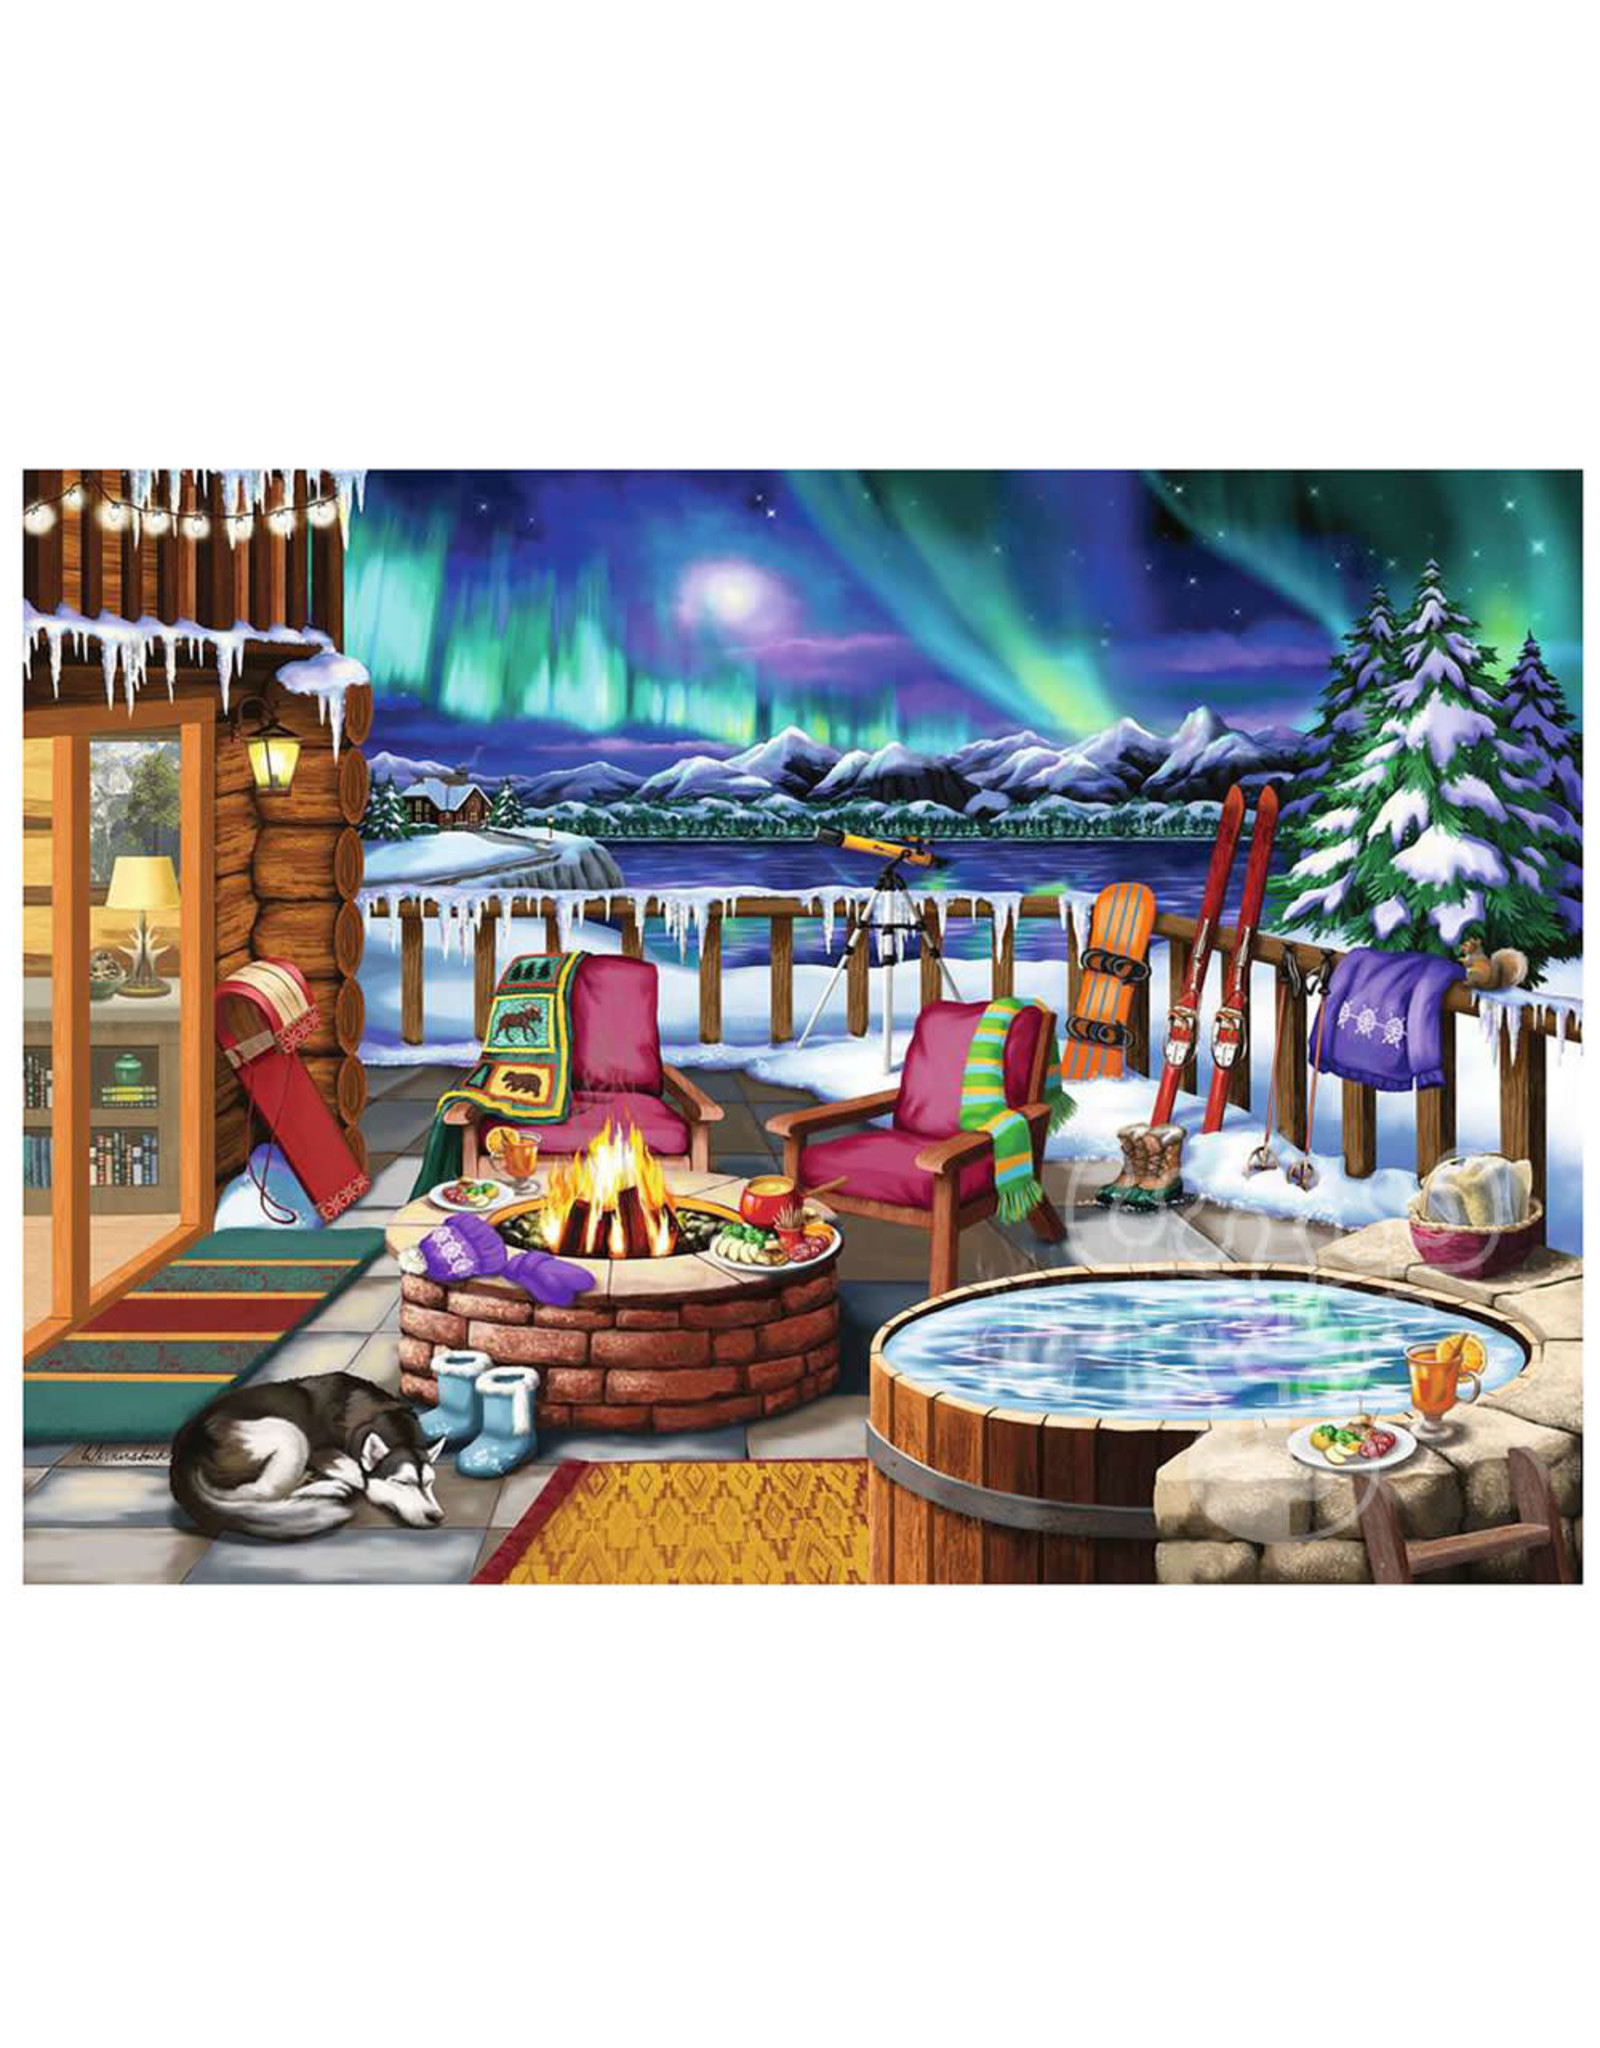 Ravensburger 500 pcs. Northern Lights Puzzle